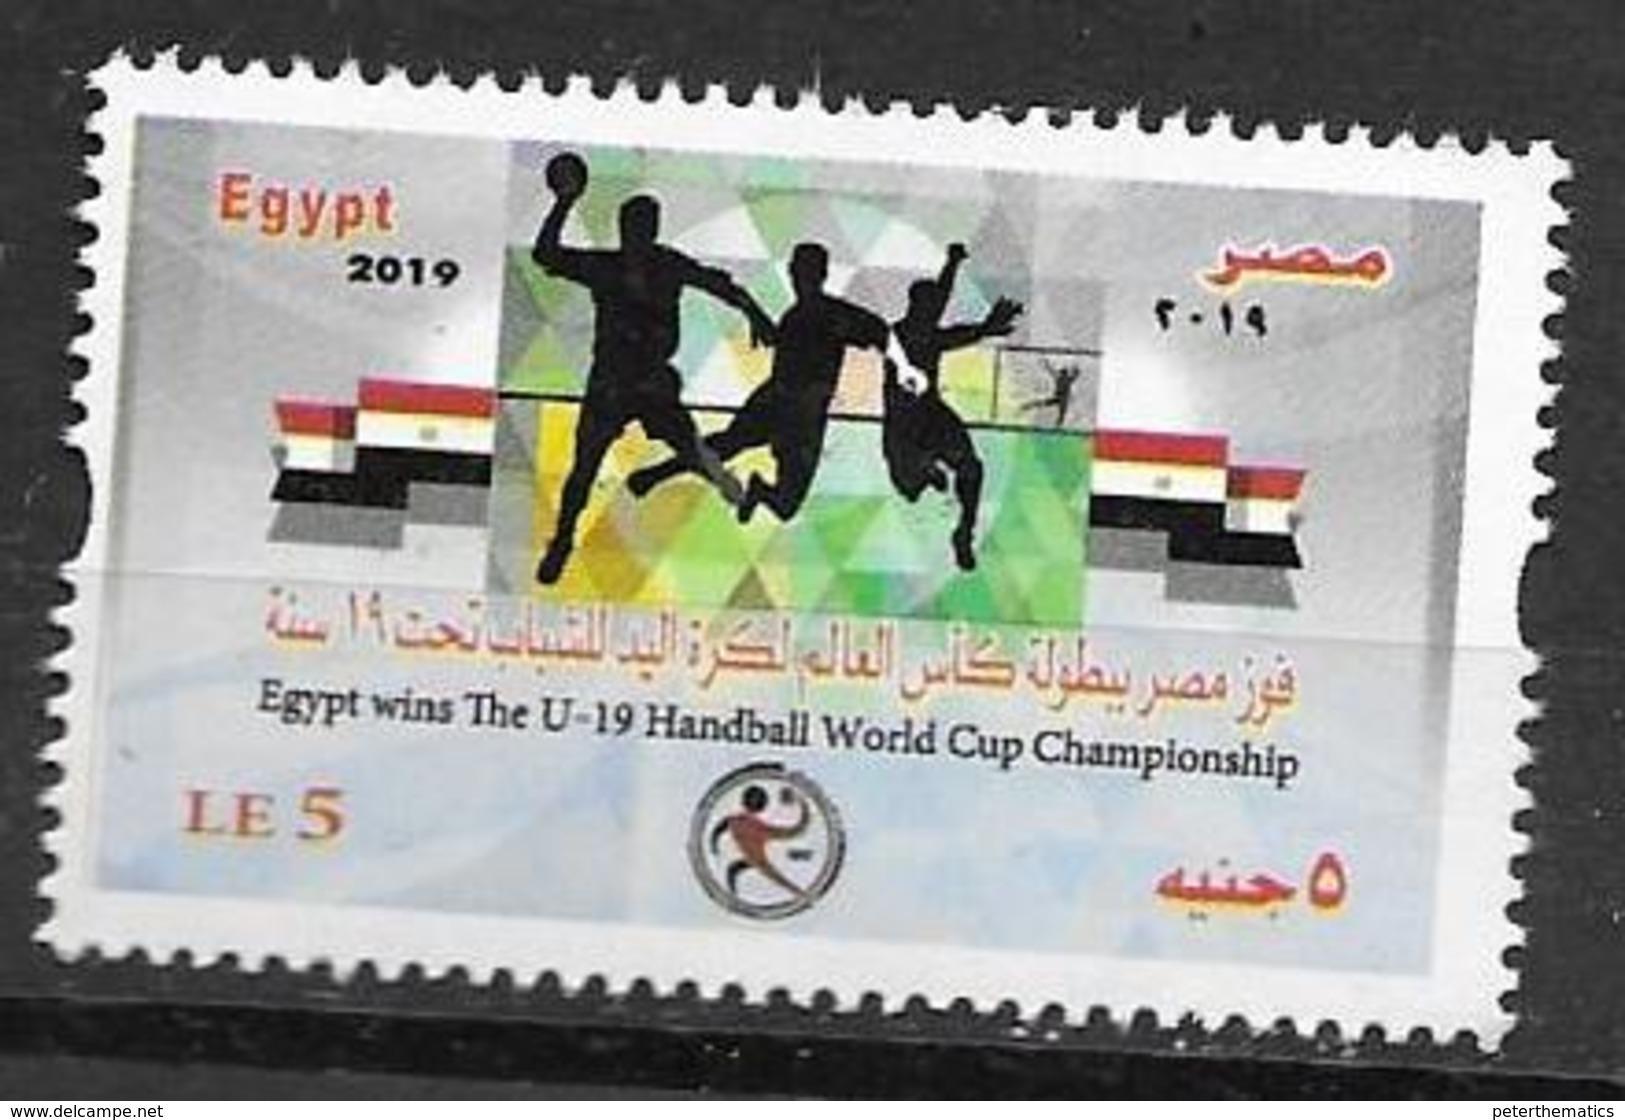 EGYPT, 2019, MNH,SPORTS, HANDBALL, EGYPT WINNERS OF U-19 HANDBALL WORLD CHAMPIONSHIP, 1v - Balonmano